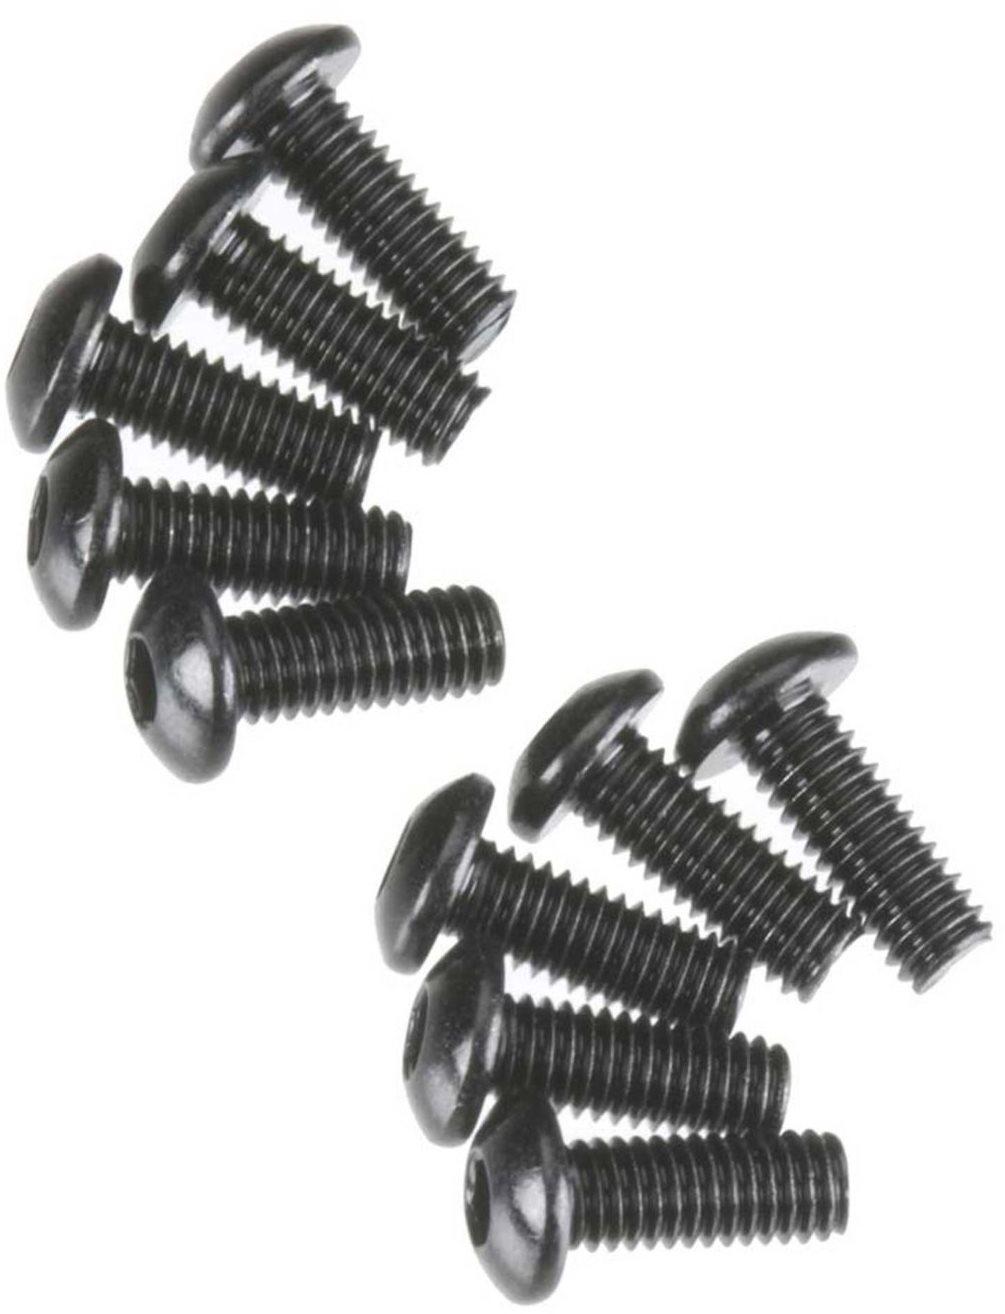 Axial Hex Socket Button Head M3x8mm Black Oxide (10)